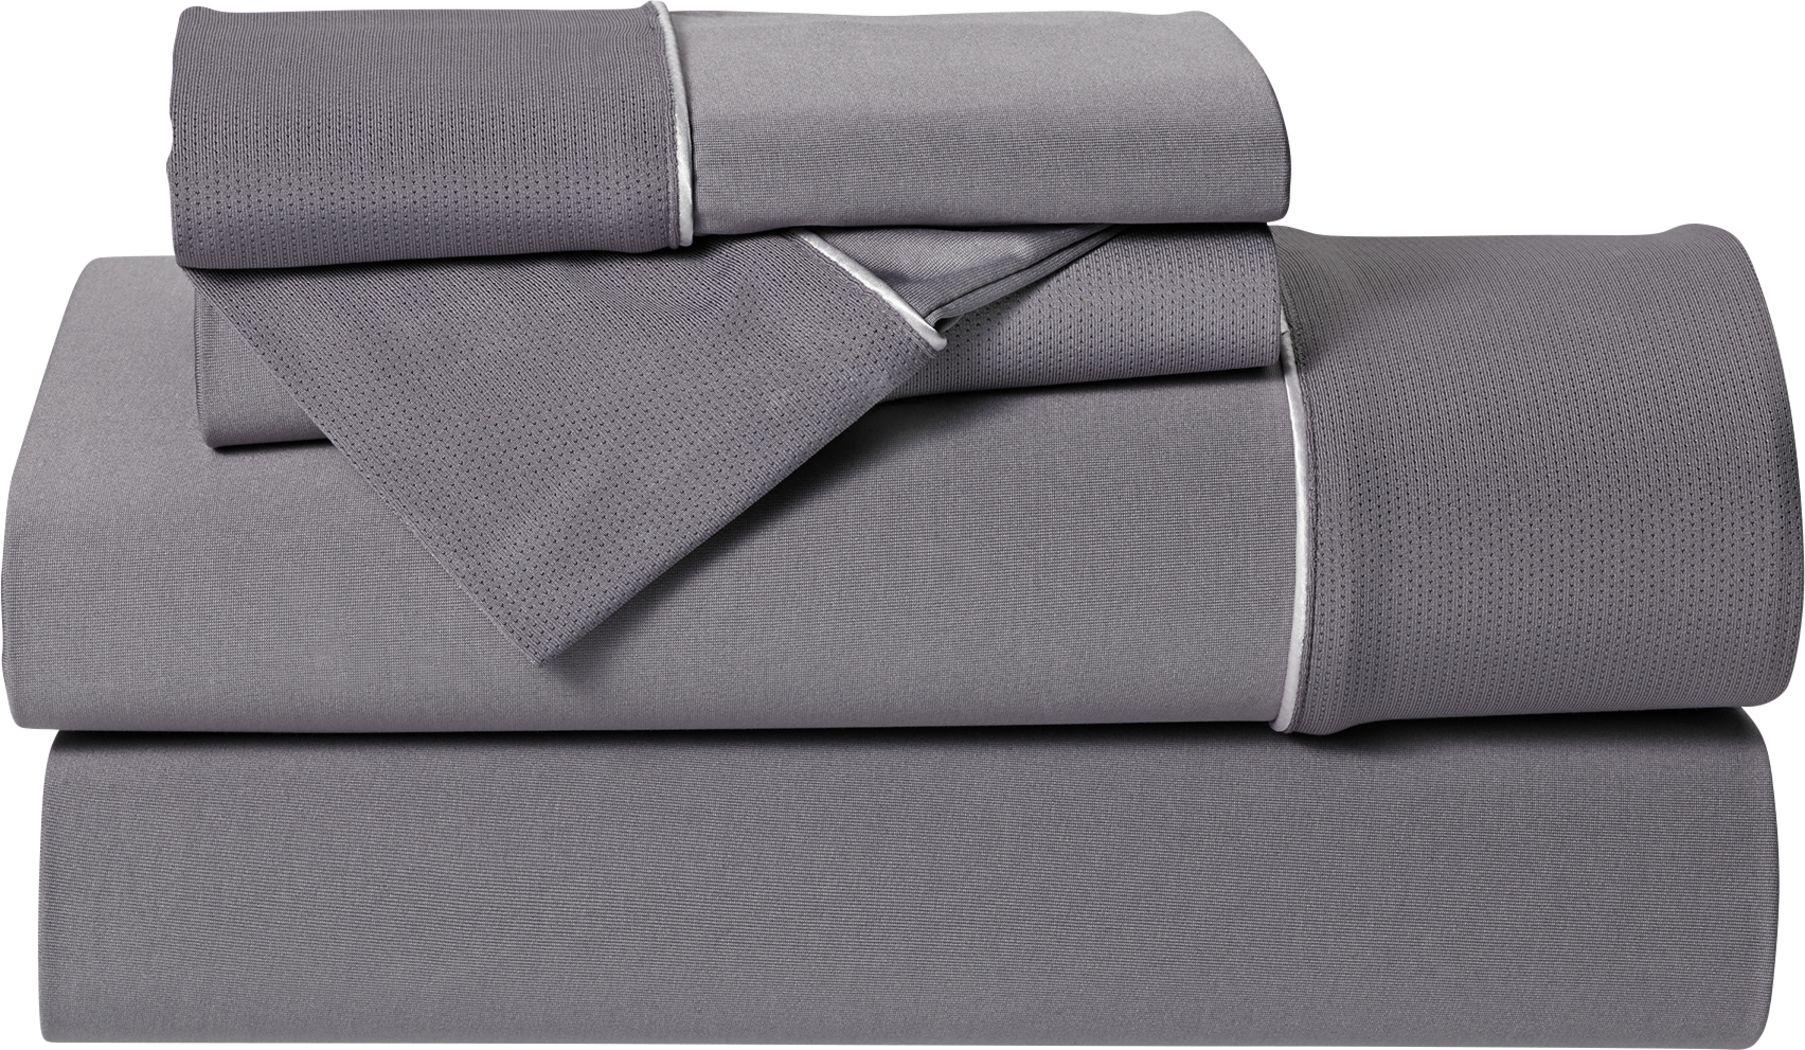 Dri-Tec Performance Granite 3 Pc Twin Bed Sheet Set